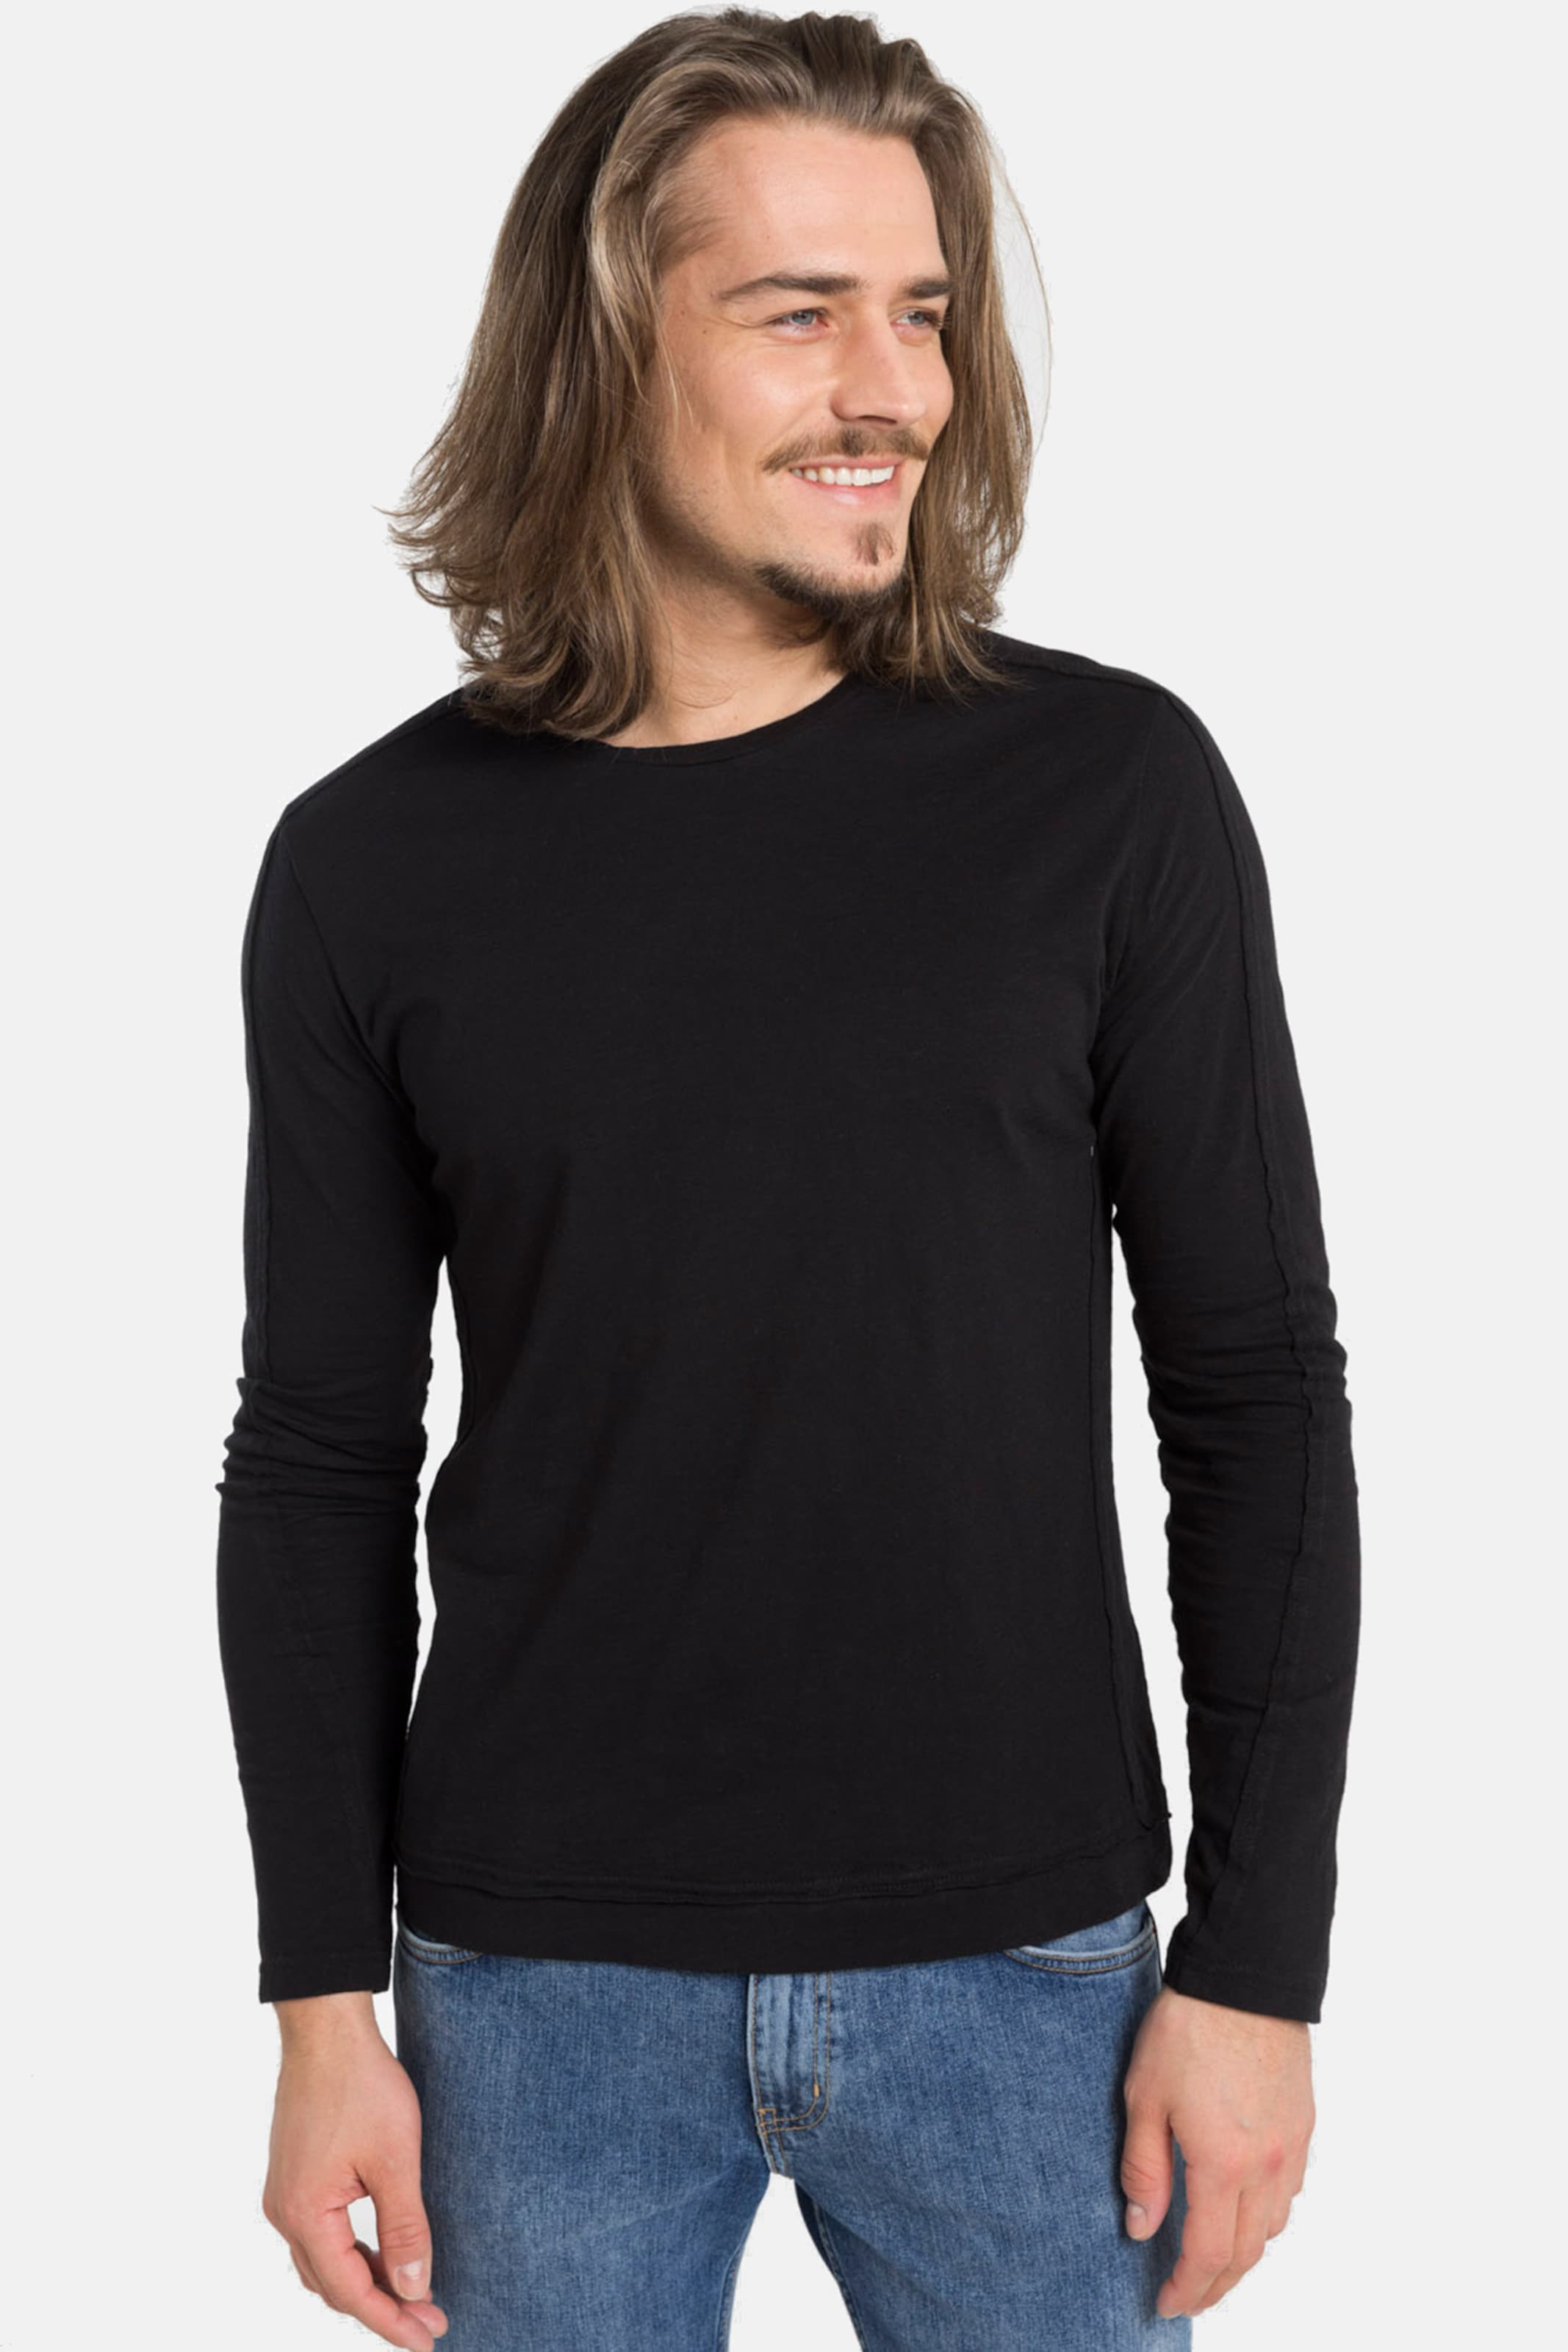 Life In Shirts 'taranto' Longsleeve For Schwarz F1lcKTJ